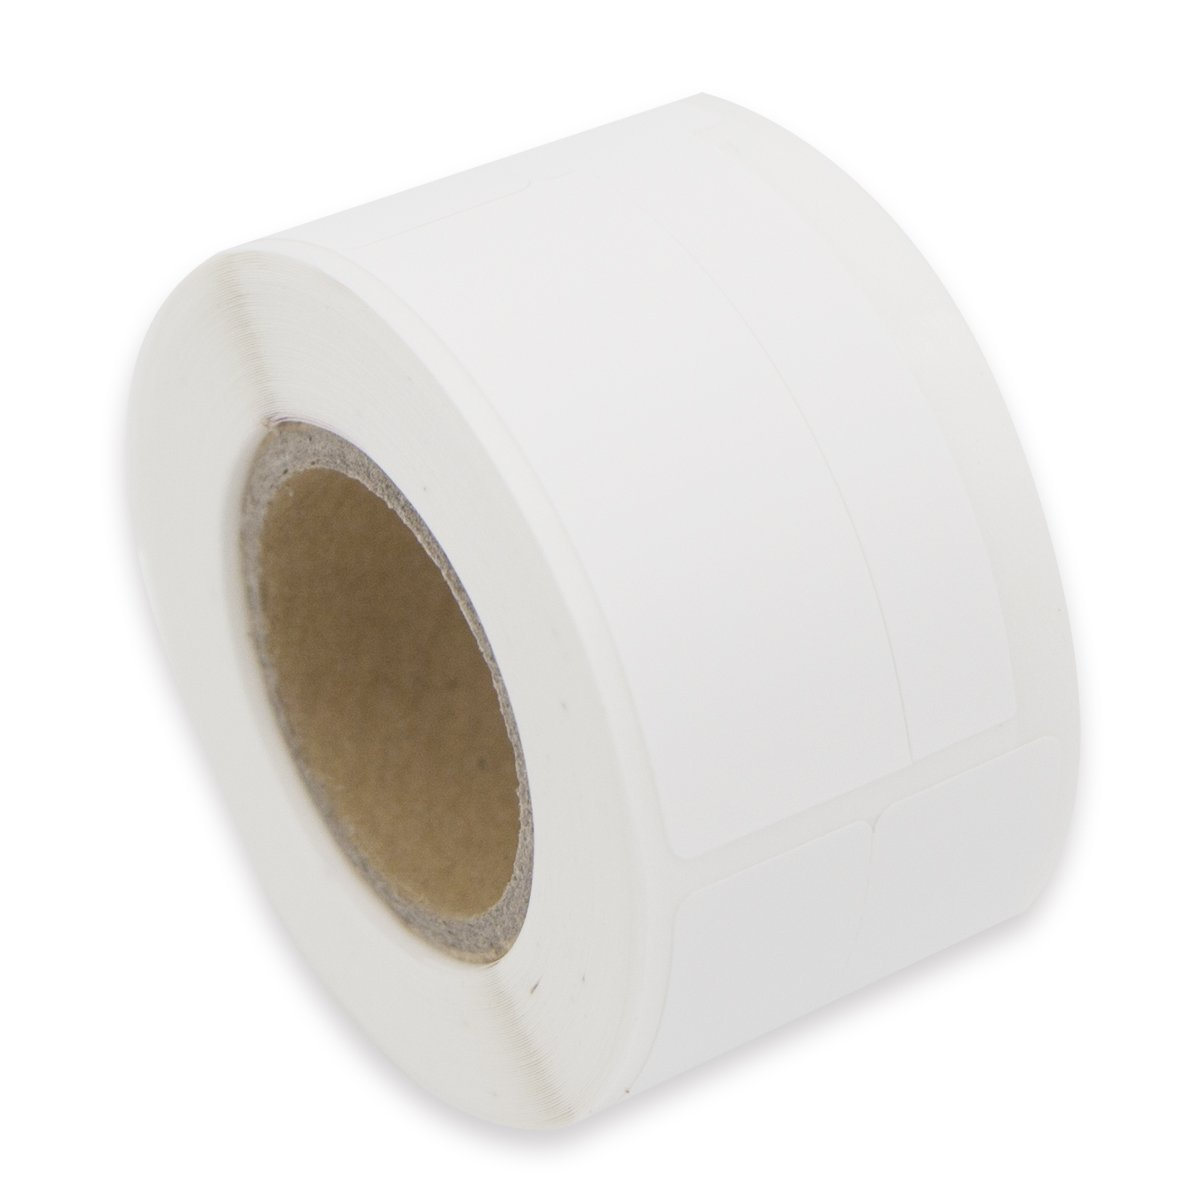 2.8x 1.2 Label maker Label Rolls bianco